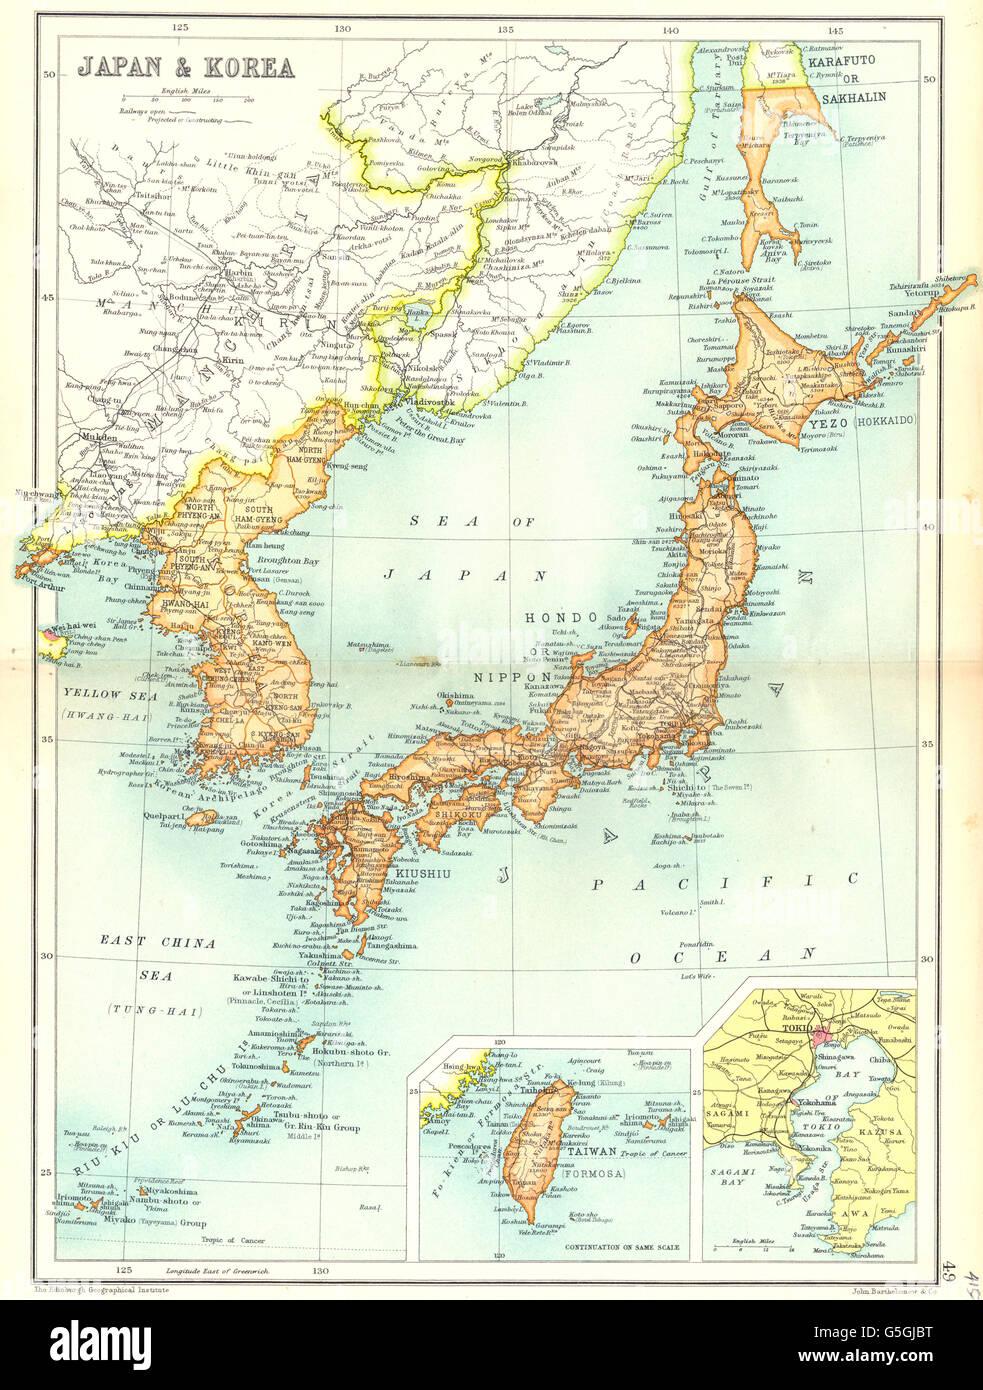 Japan korea inset maps of taiwan tokyo cassells 1909 stock japan korea inset maps of taiwan tokyo cassells 1909 gumiabroncs Images